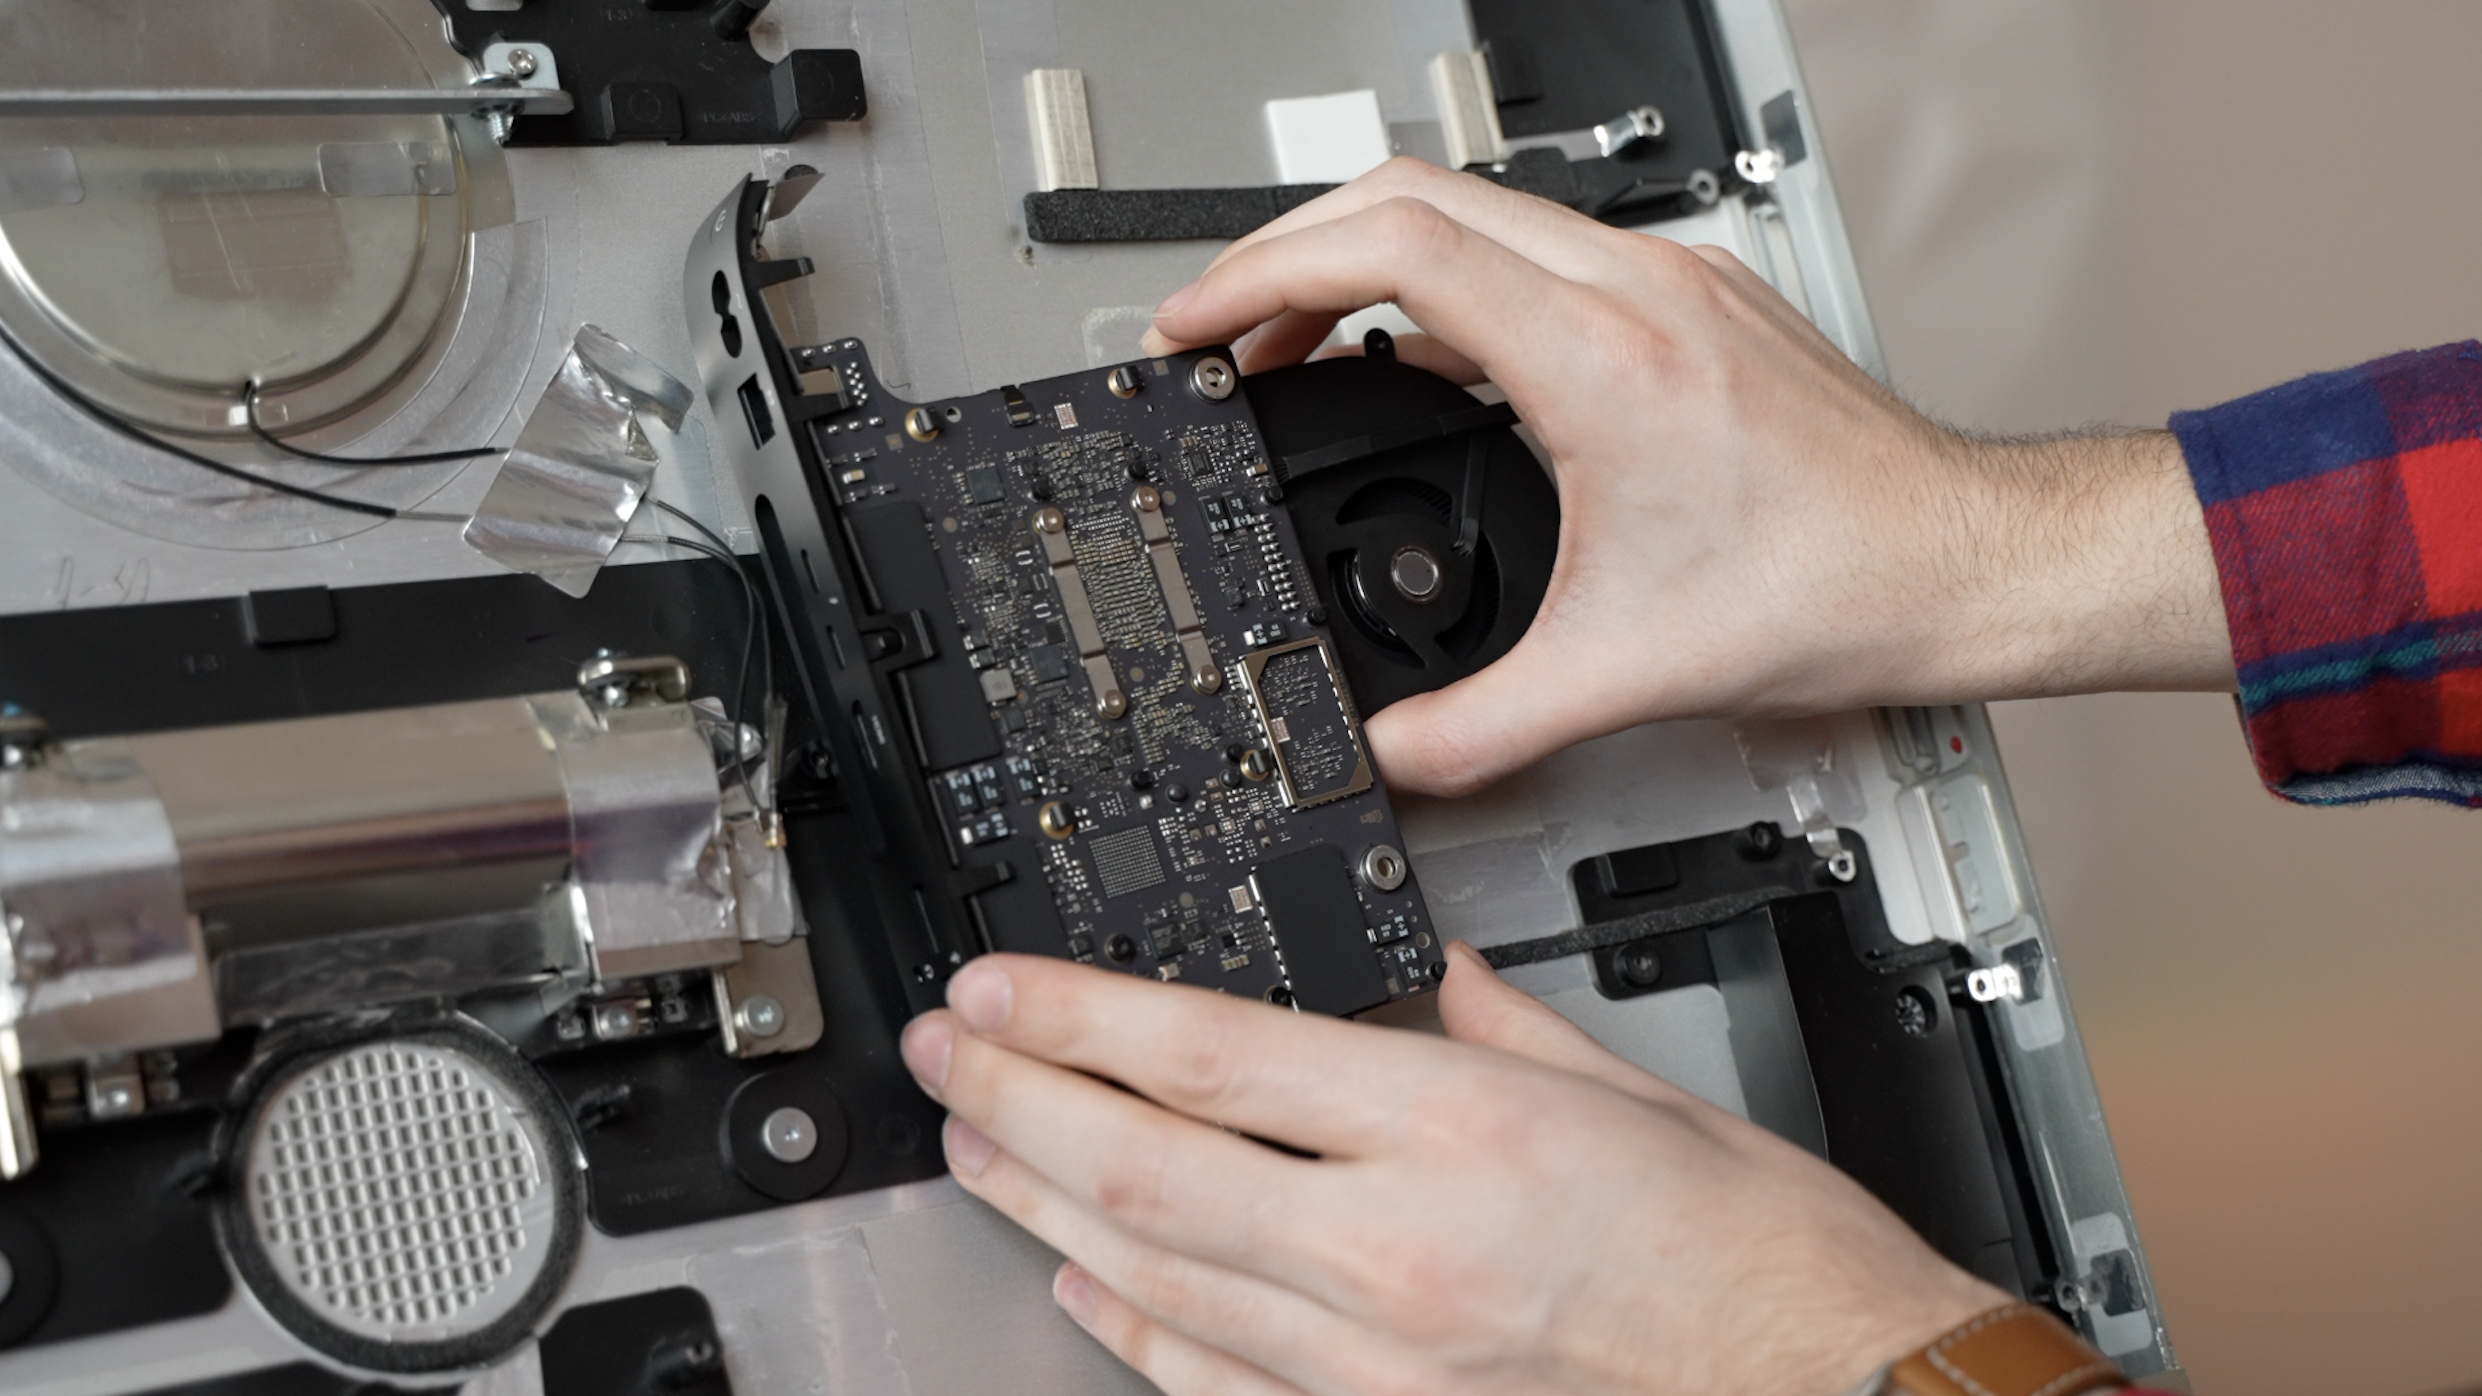 Inserting an M1 logic board into an iMac body